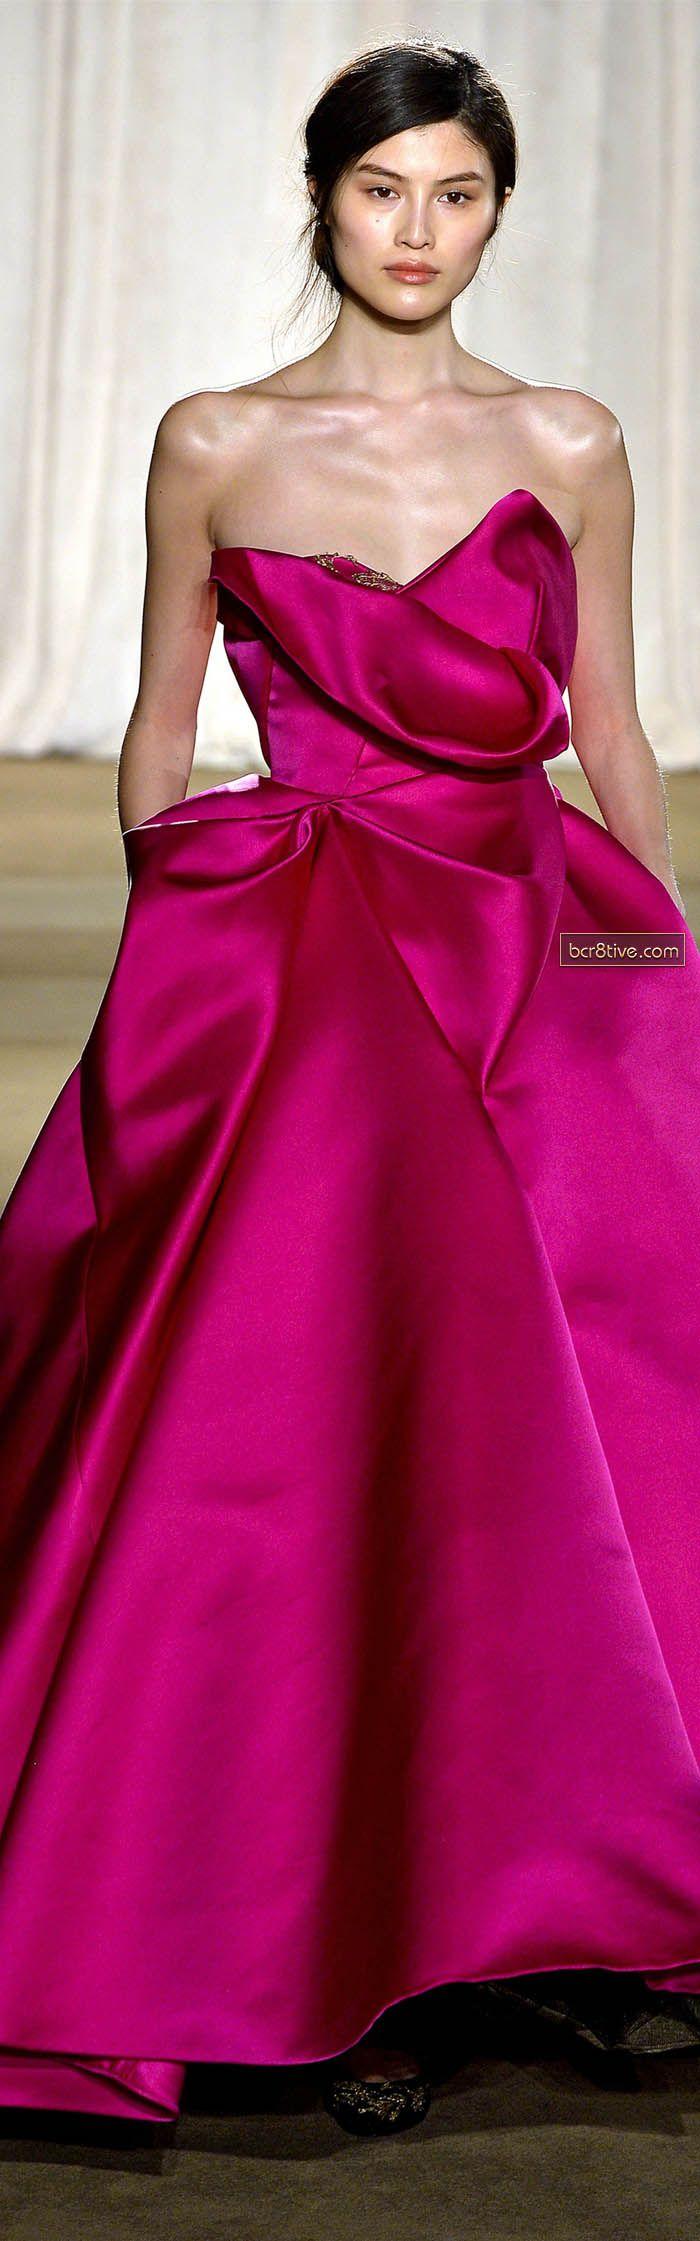 Wedding Fuschia Dress 17 best ideas about fuschia dress on pinterest pink neon dresses and bright summer outfits